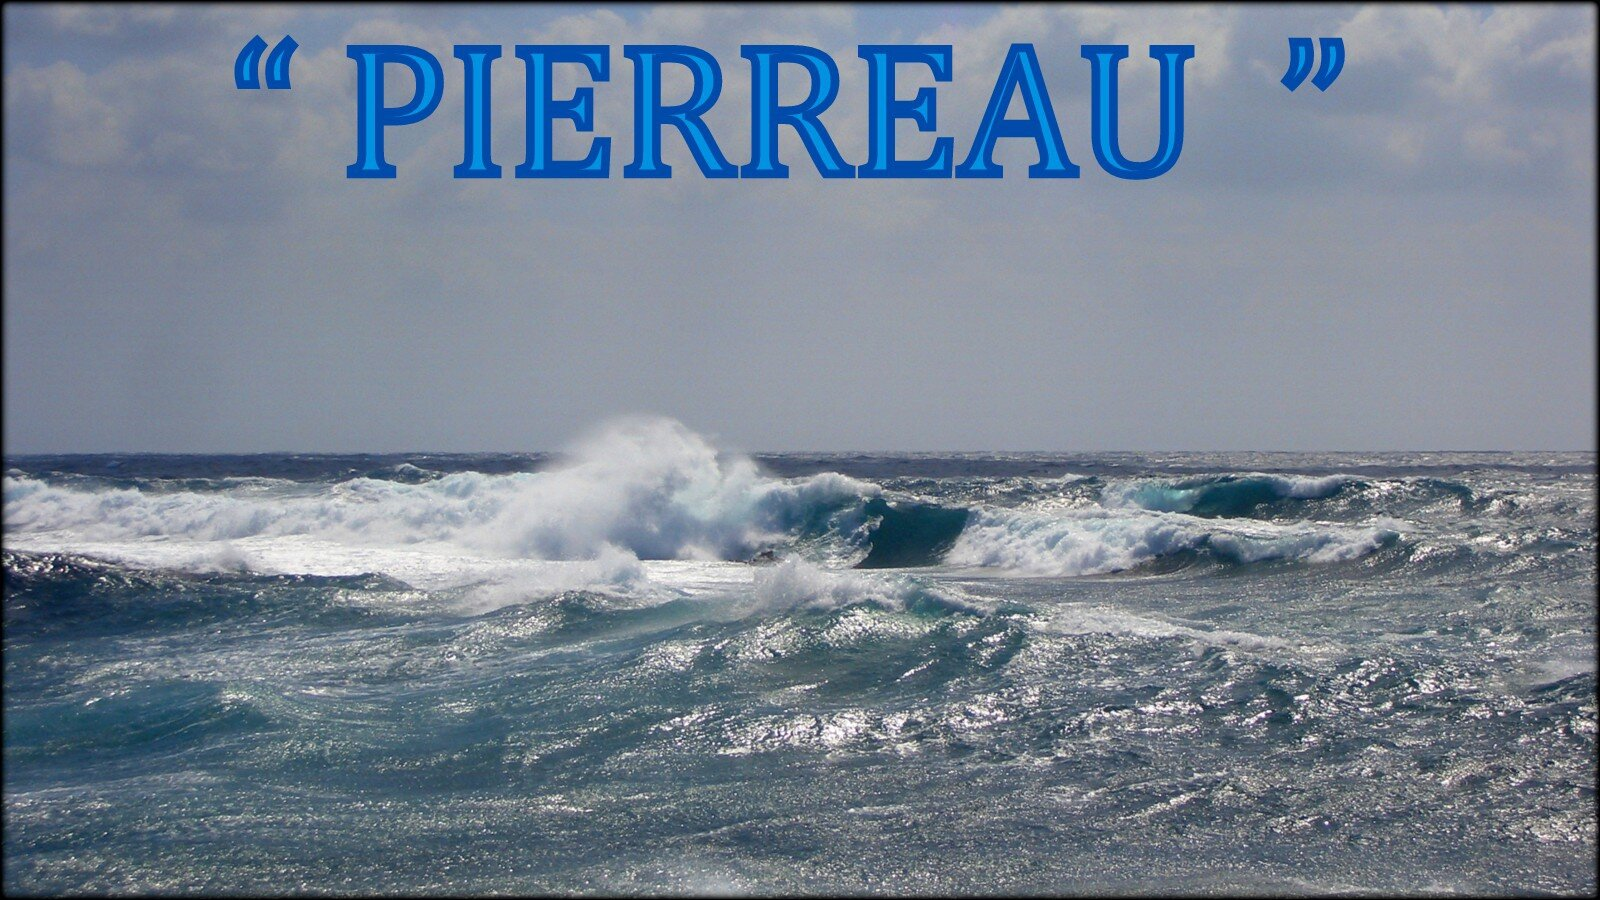 PIERREAU__SPOT__100___WAVESAILING_